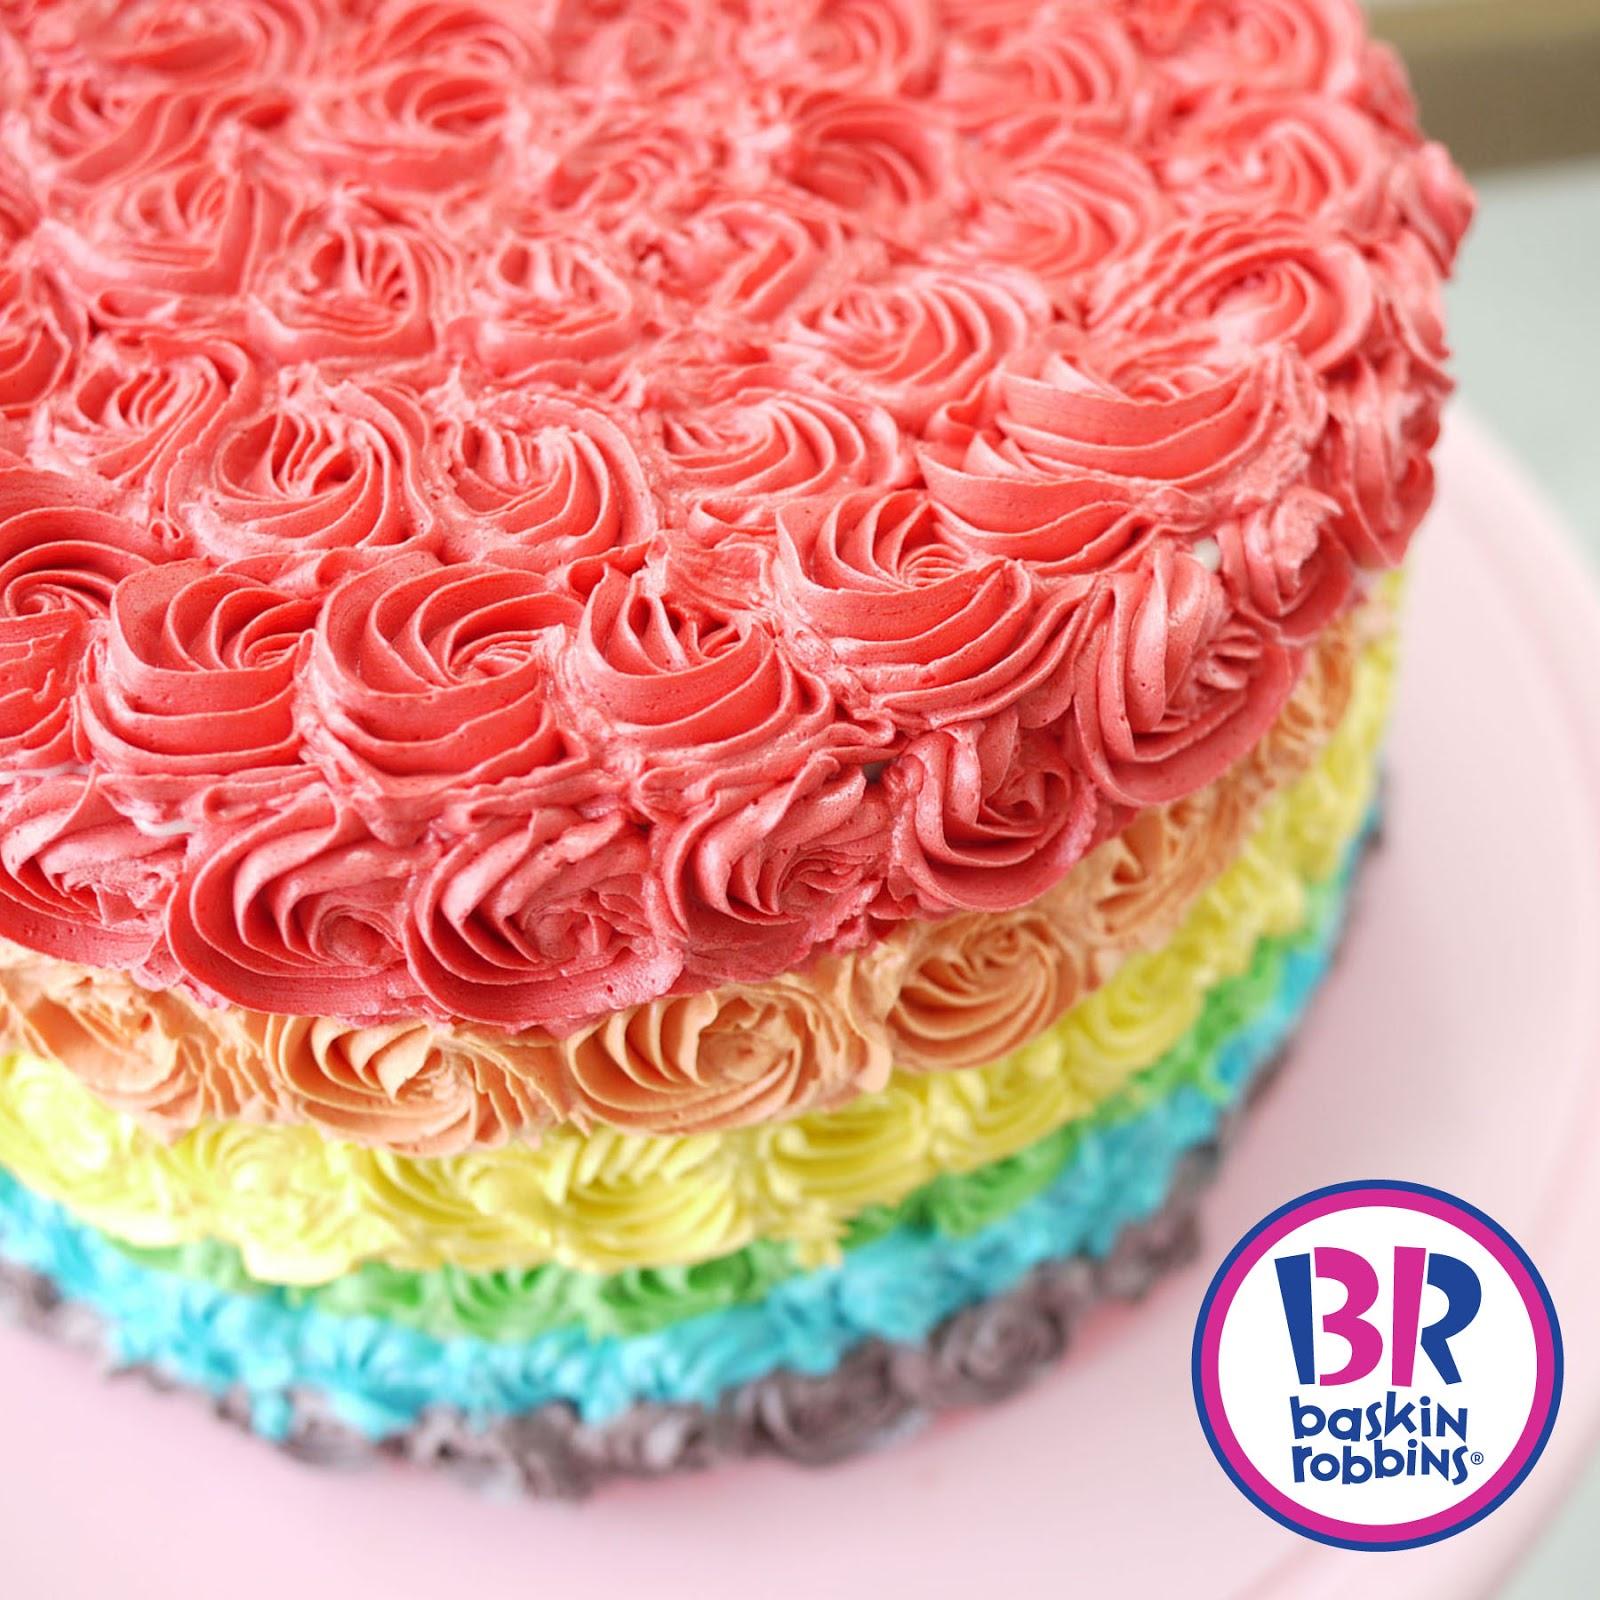 how to serve baskin robbins ice cream cake